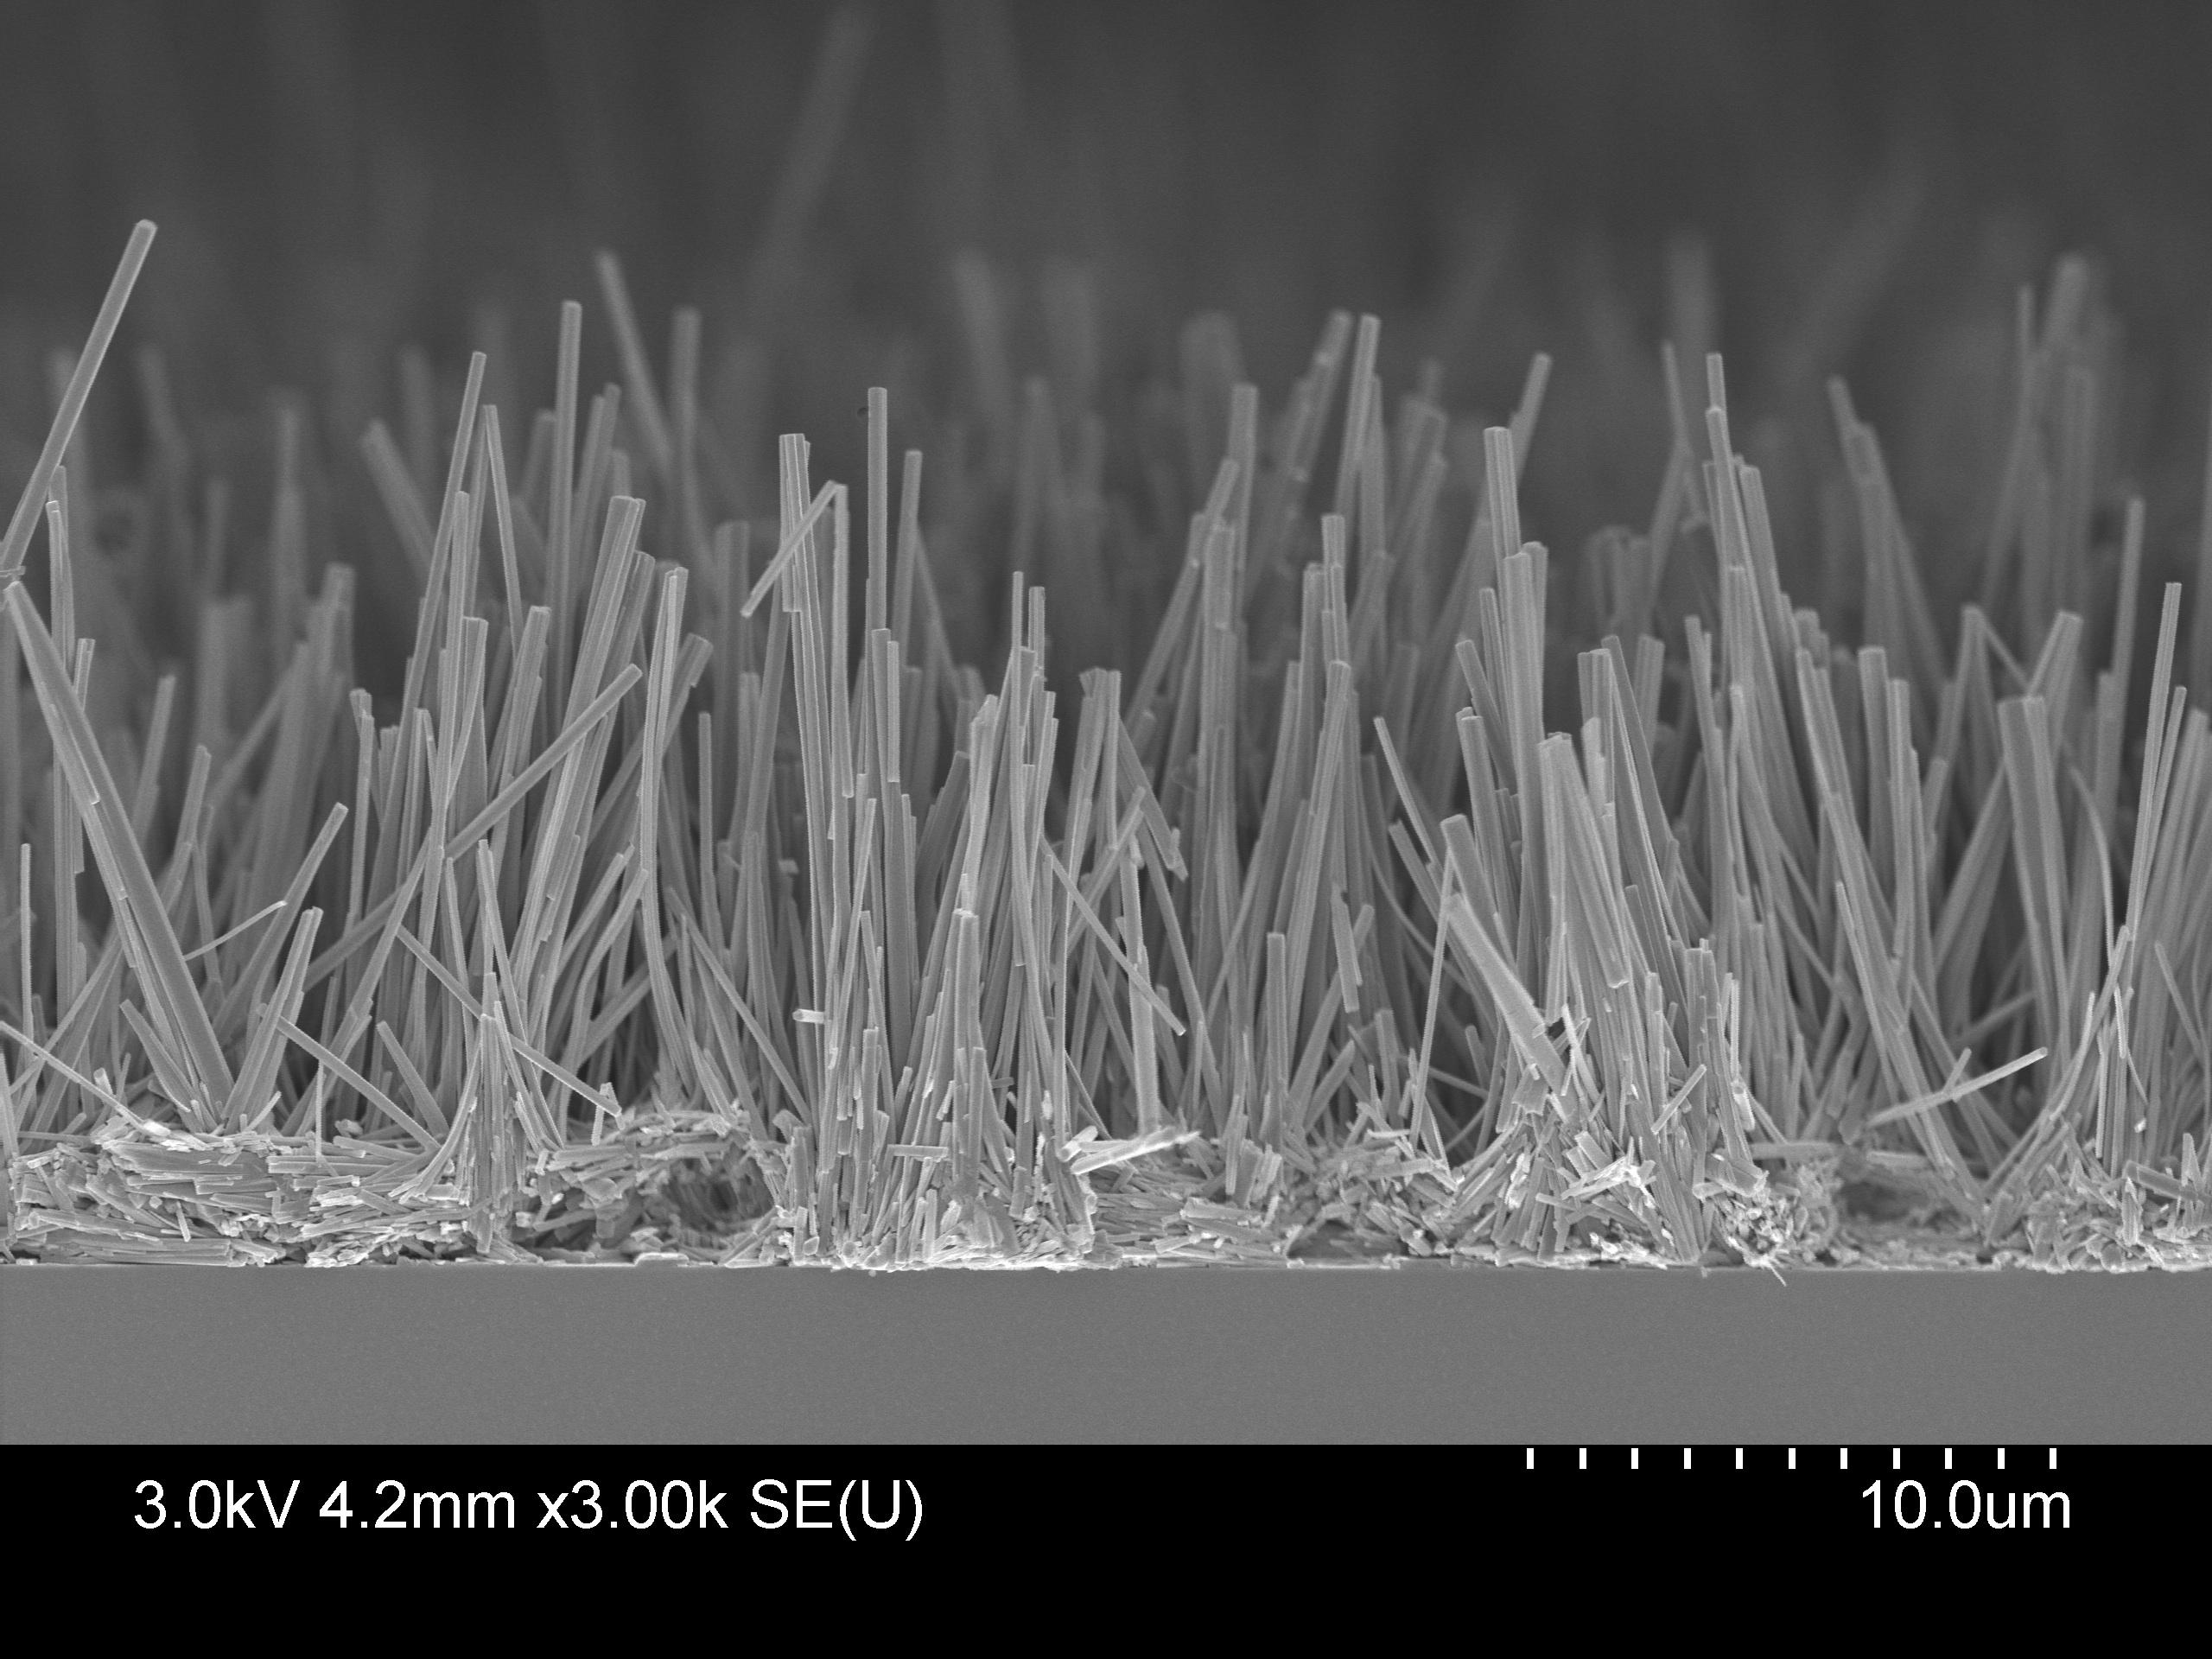 Vertical nanowires